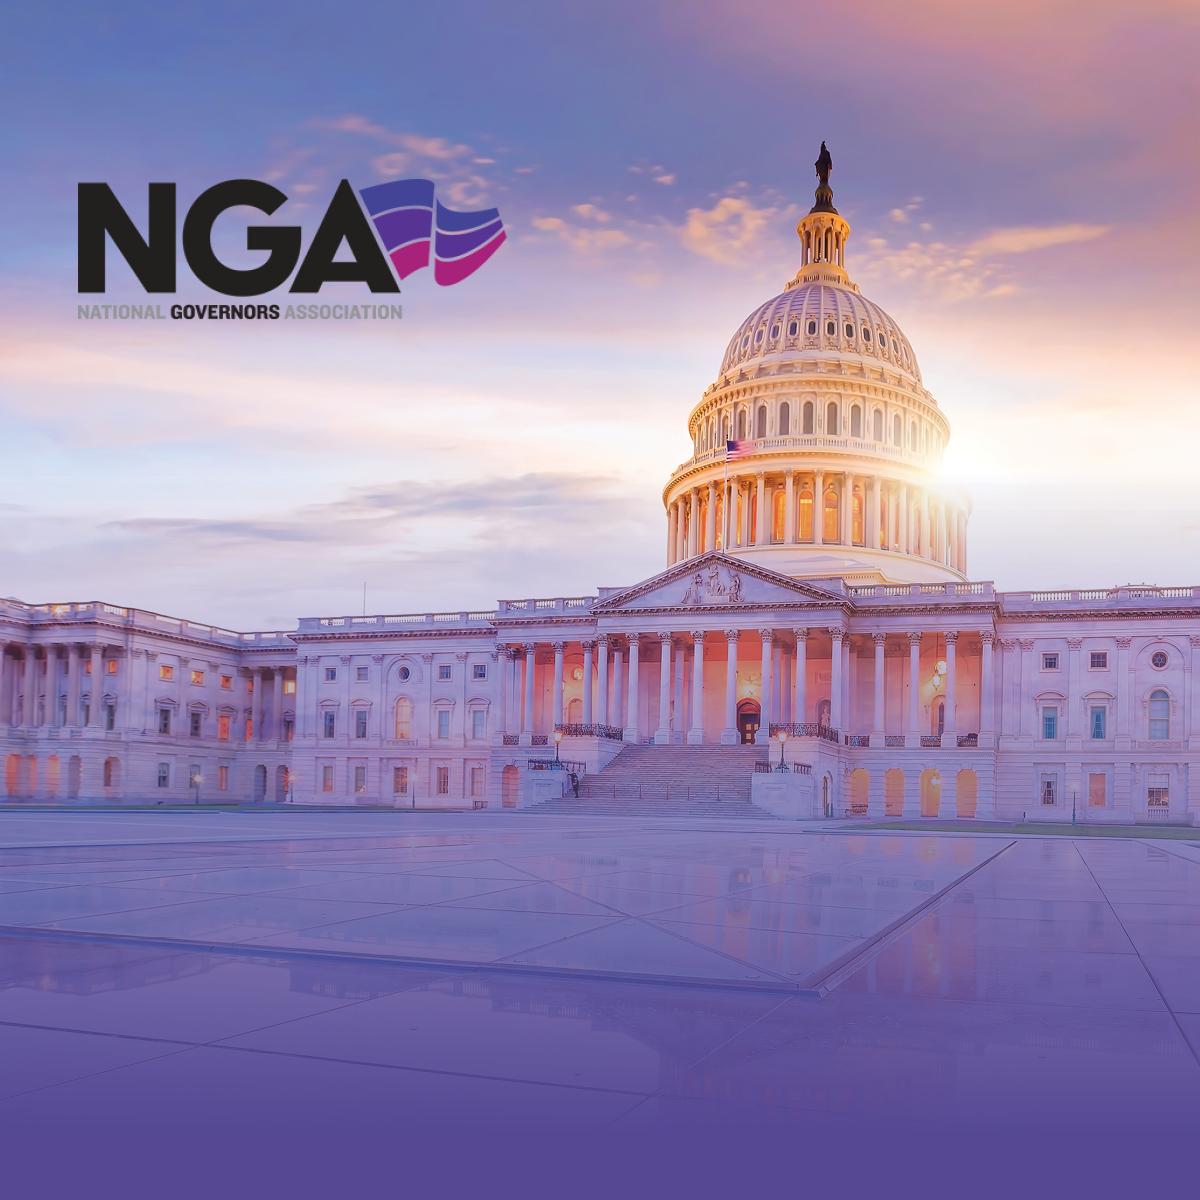 April_NEWS National Governors Association